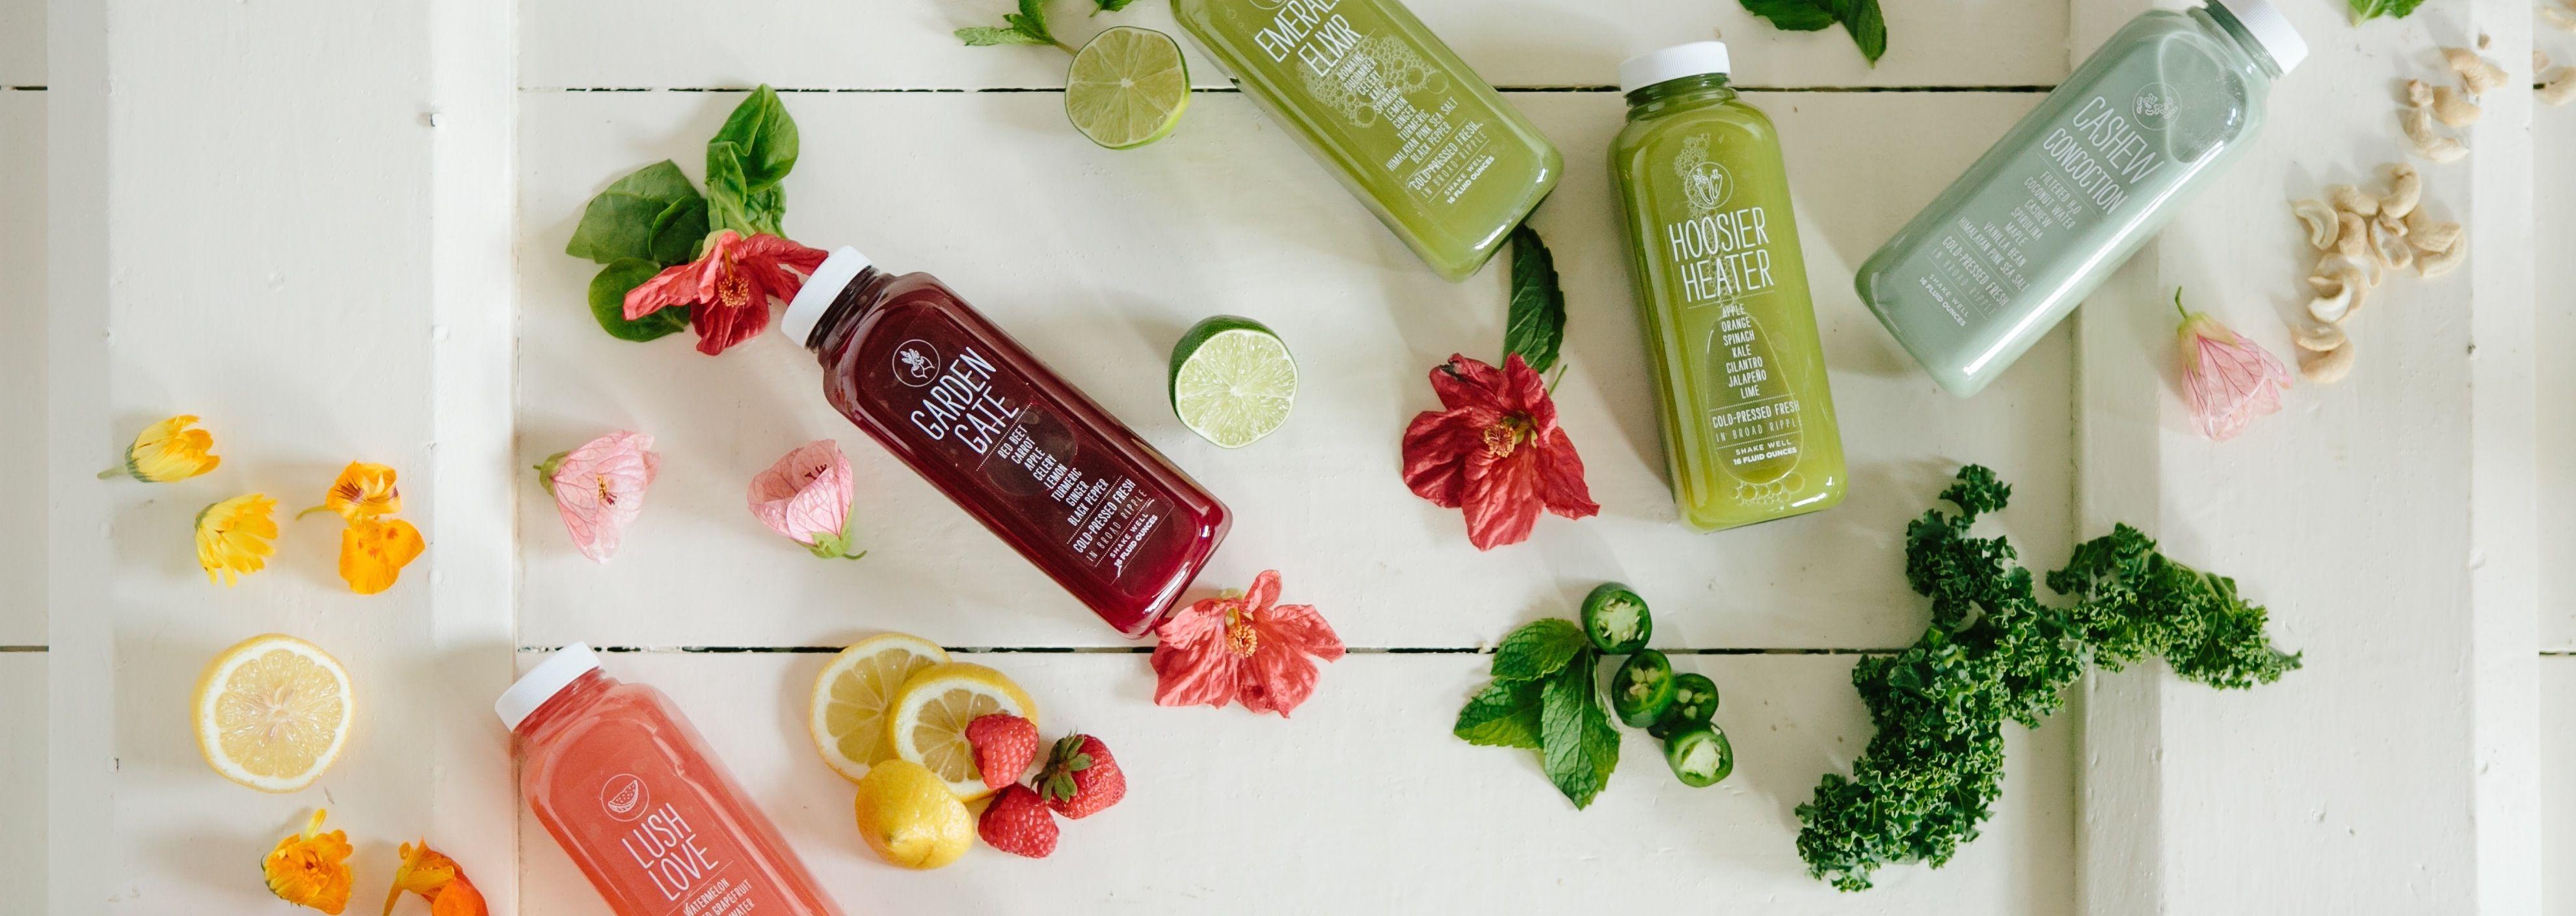 Juices - The Garden Table  Fresh Juicery in Broad Ripple  Garden